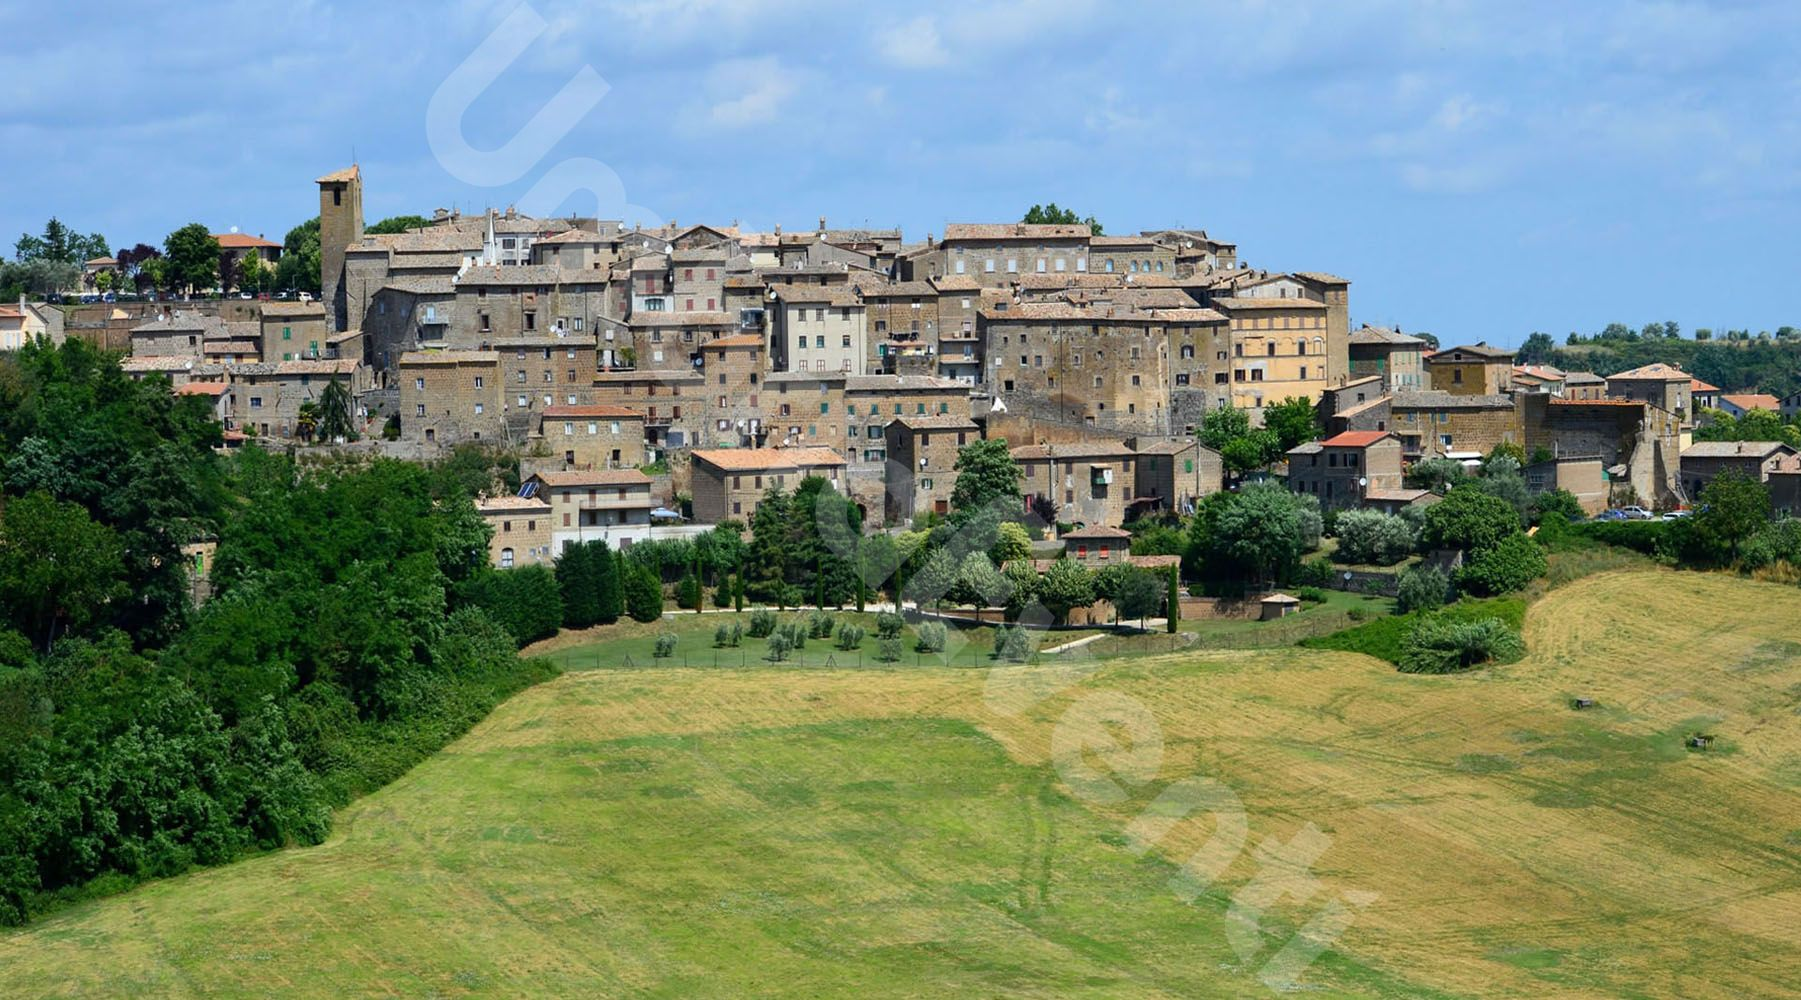 Borgo in Festa - Porano